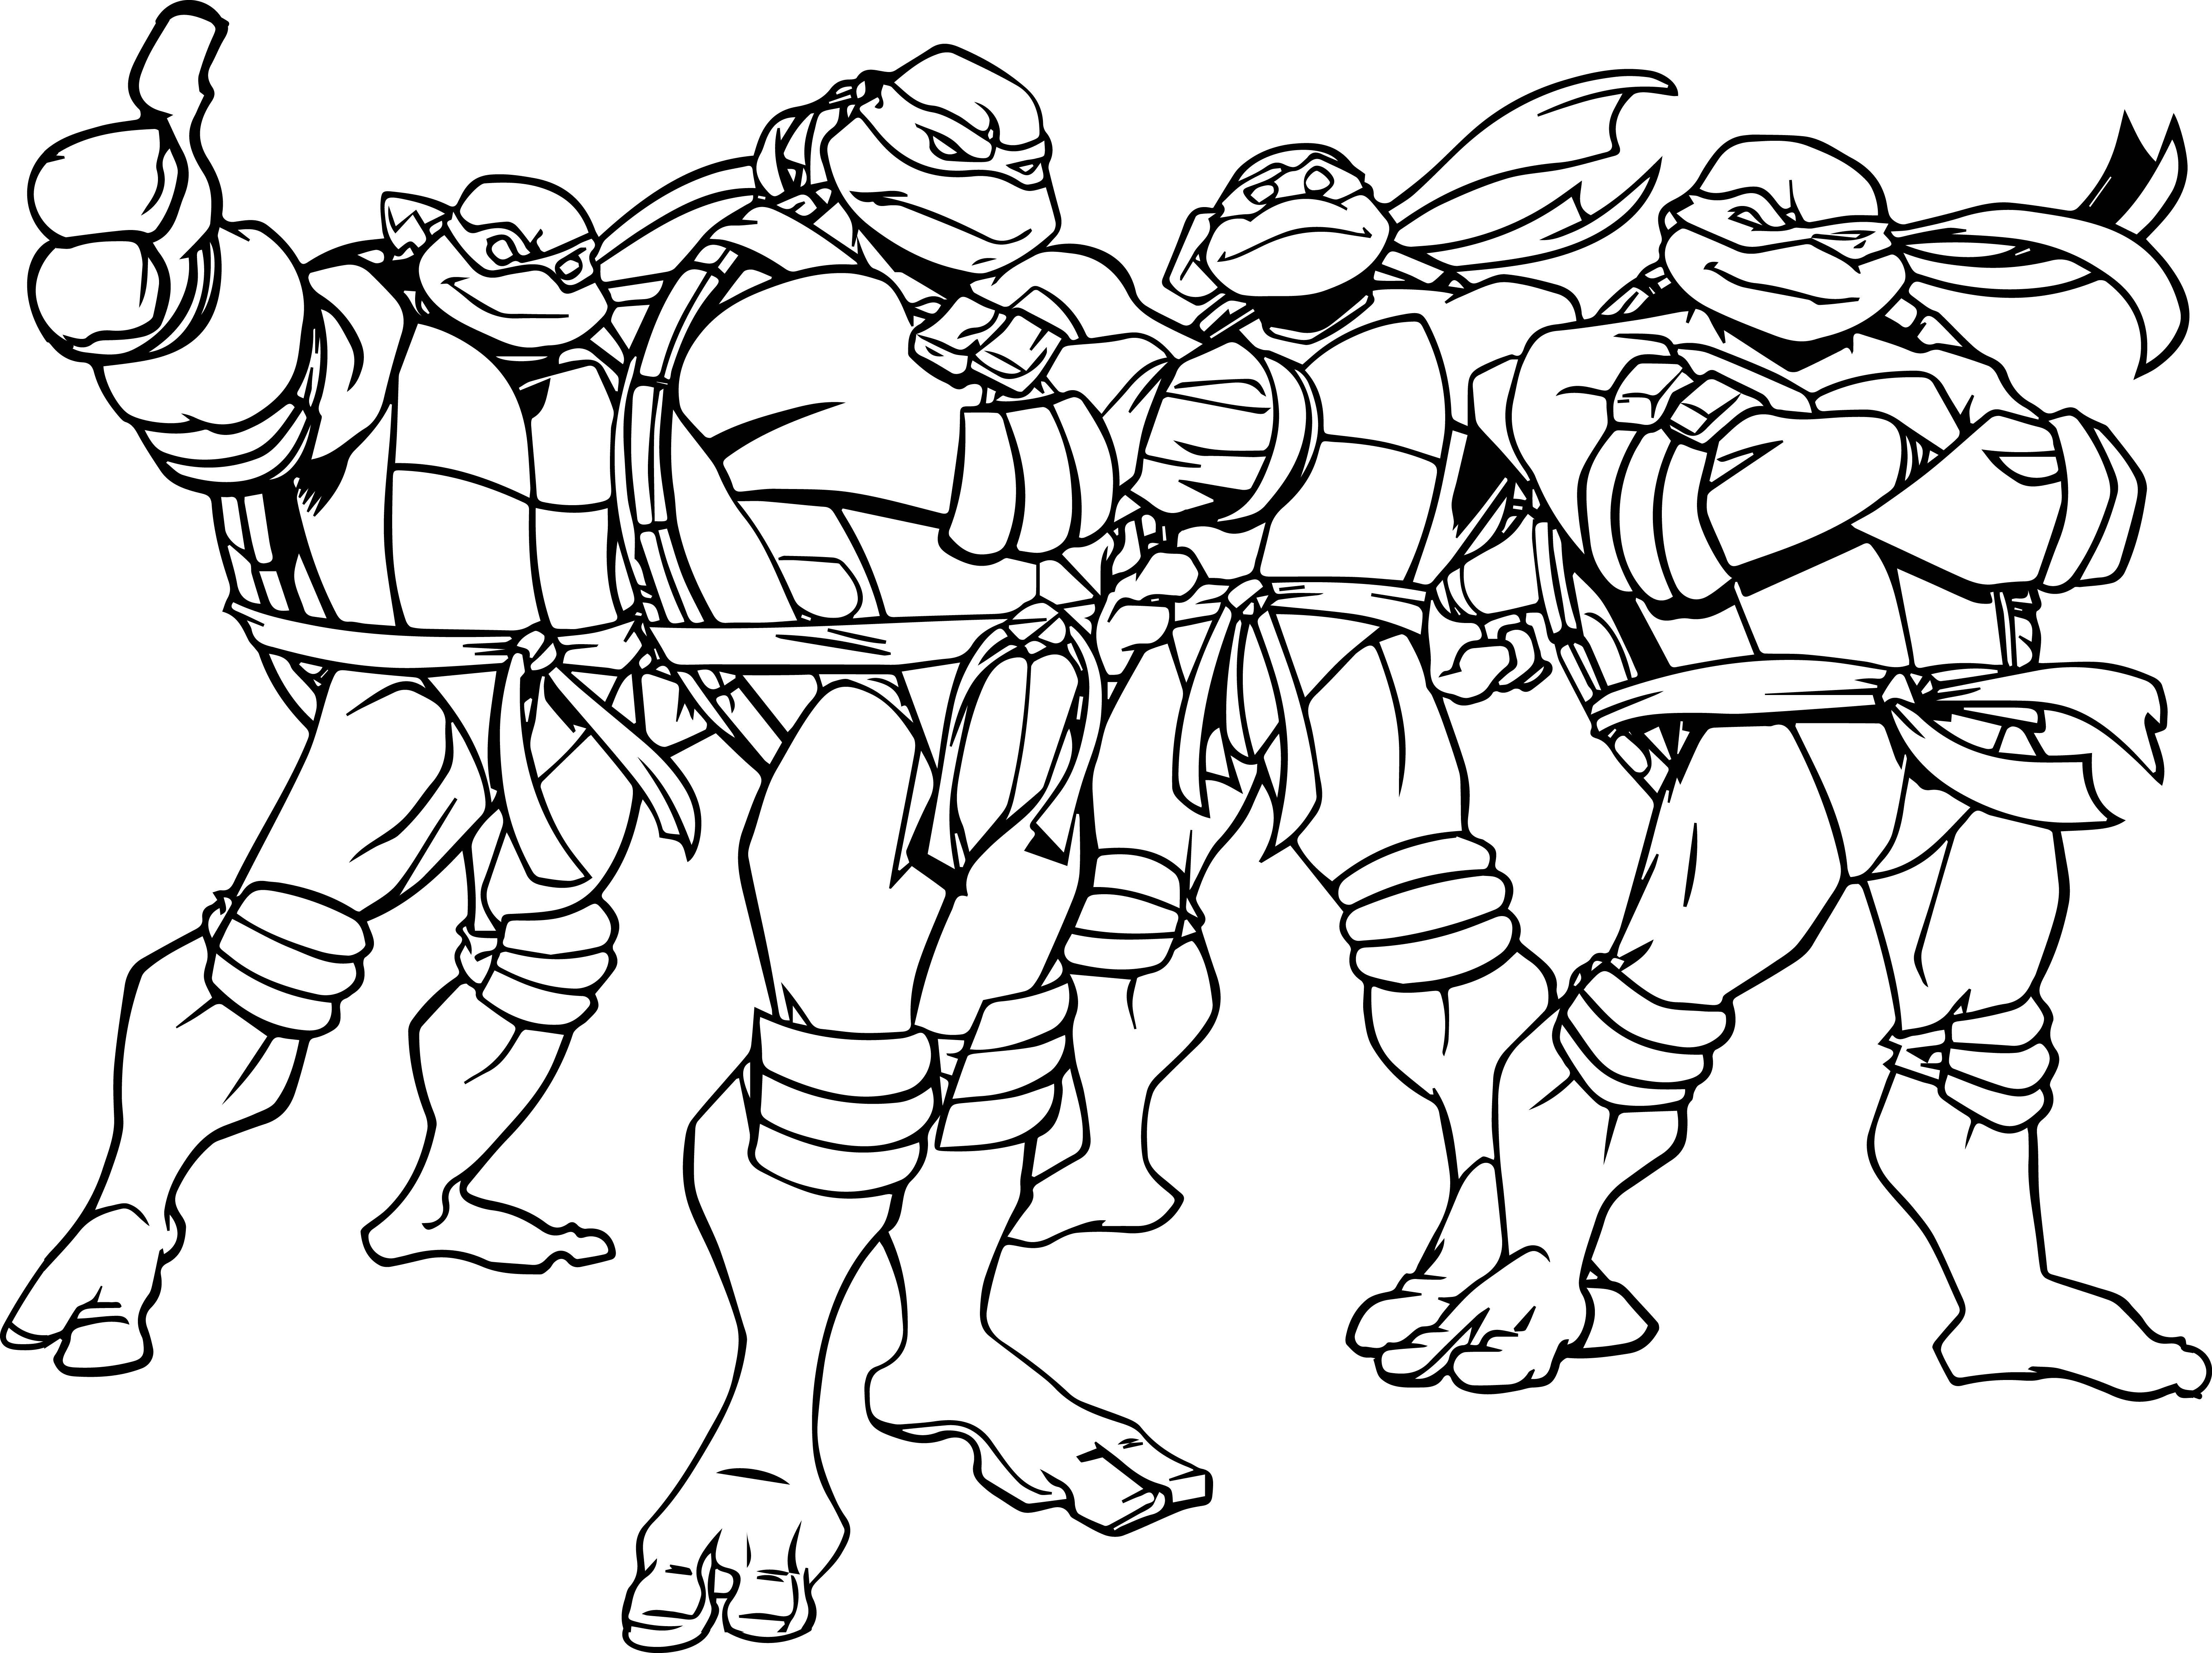 ninja turtle printable coloring pages teenage mutant ninja turtles coloring pages printable at printable coloring ninja turtle pages